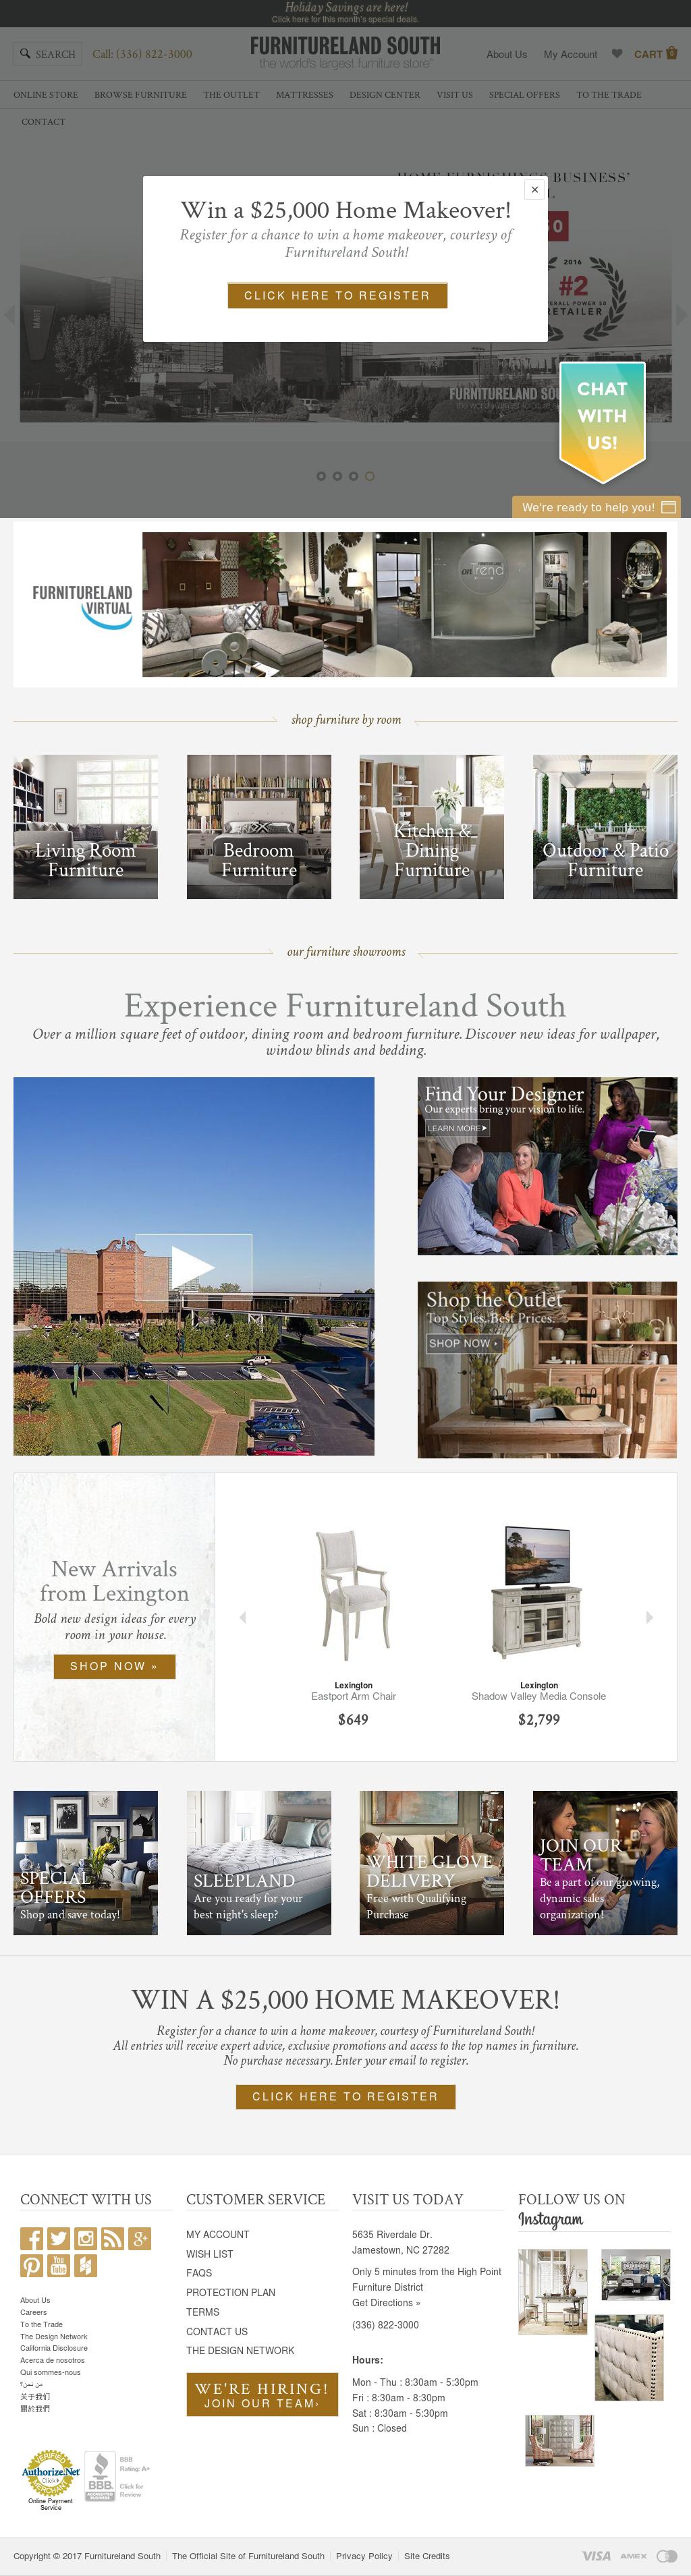 Furnitureland South Map Furniture Ideas